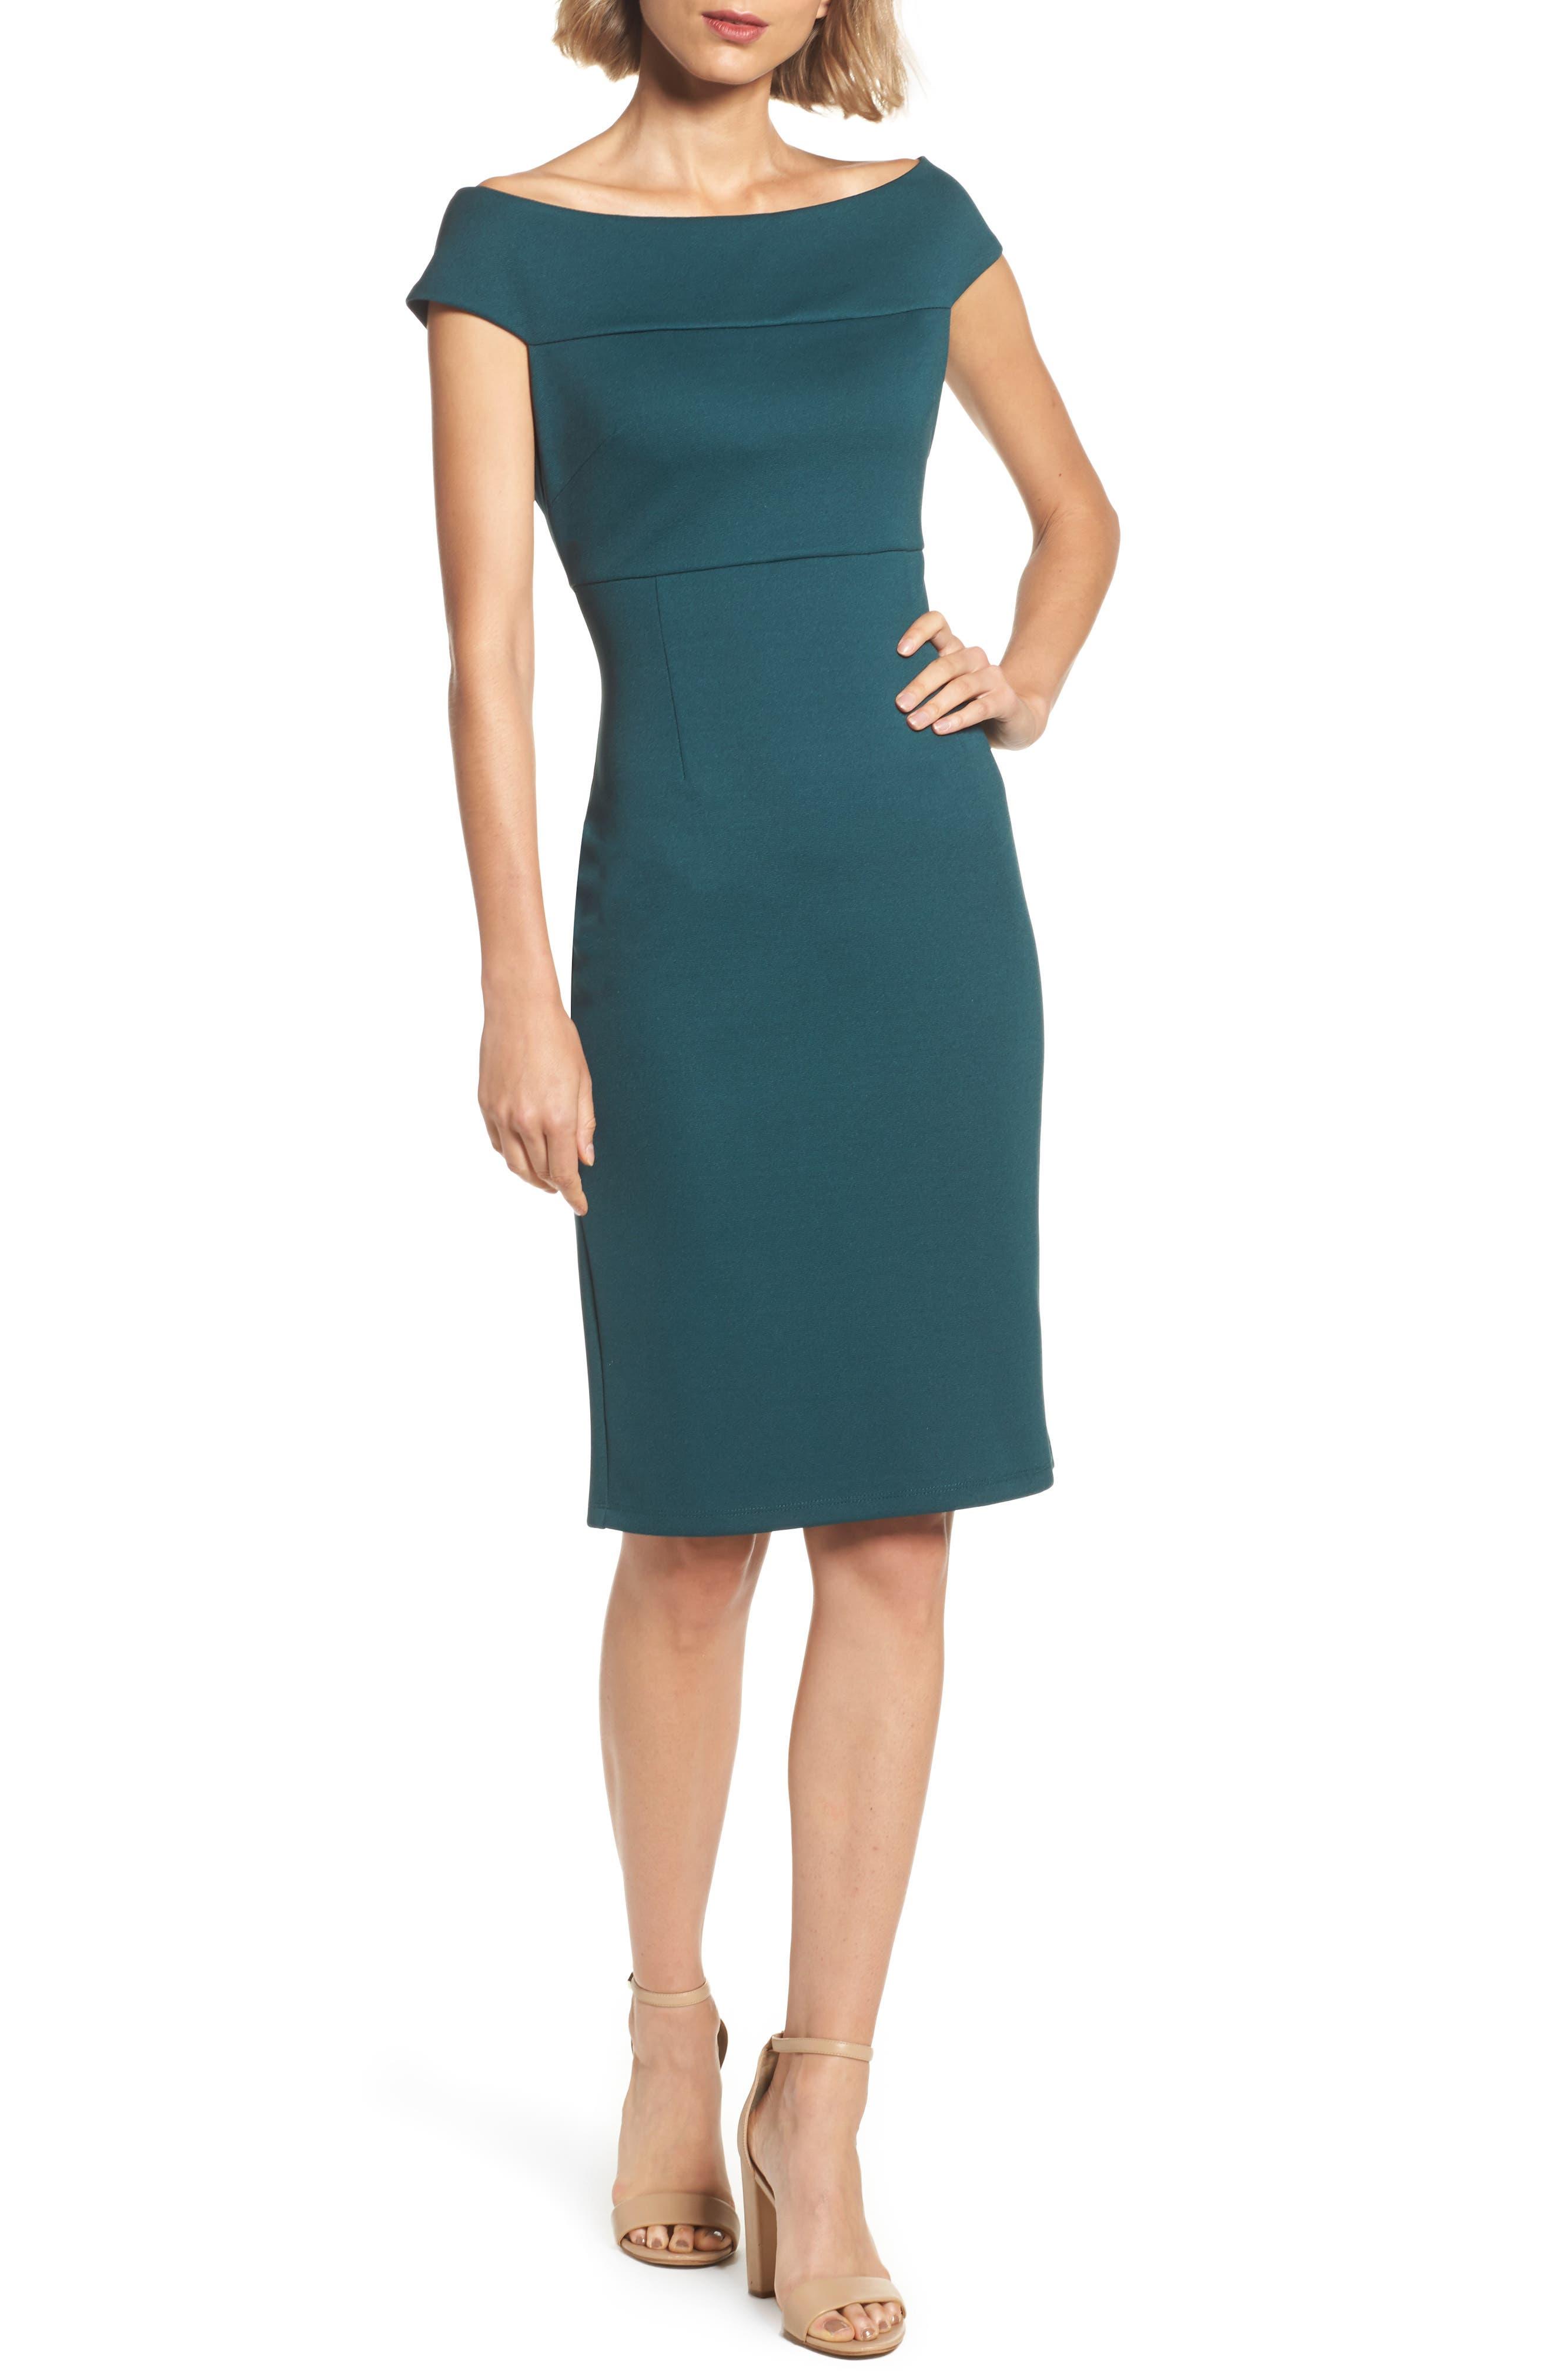 Alternate Image 1 Selected - Adrianna Papell Sheath Dress (Regular & Petite)